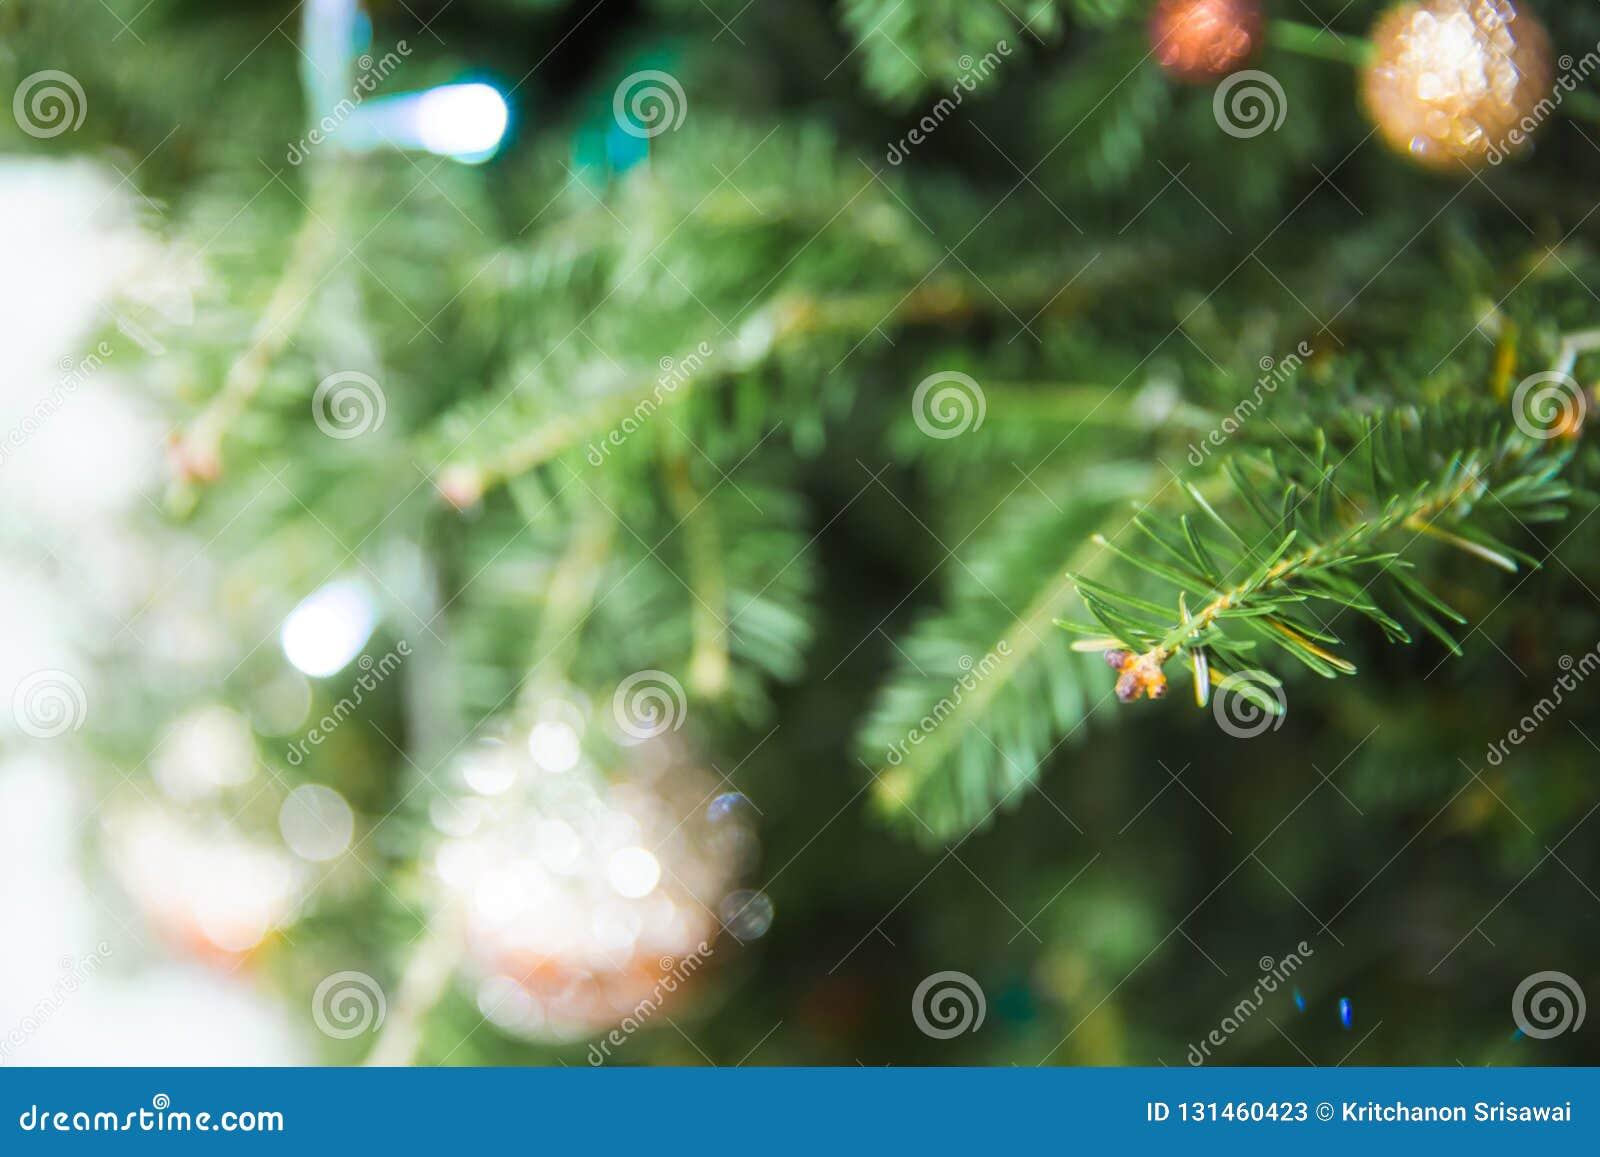 Defocused της ένωσης μπιχλιμπιδιών στο χριστουγεννιάτικο δέντρο με άλλα παιχνίδια Μπορέστε να χρησιμοποιηθείτε για το υπόβαθρο